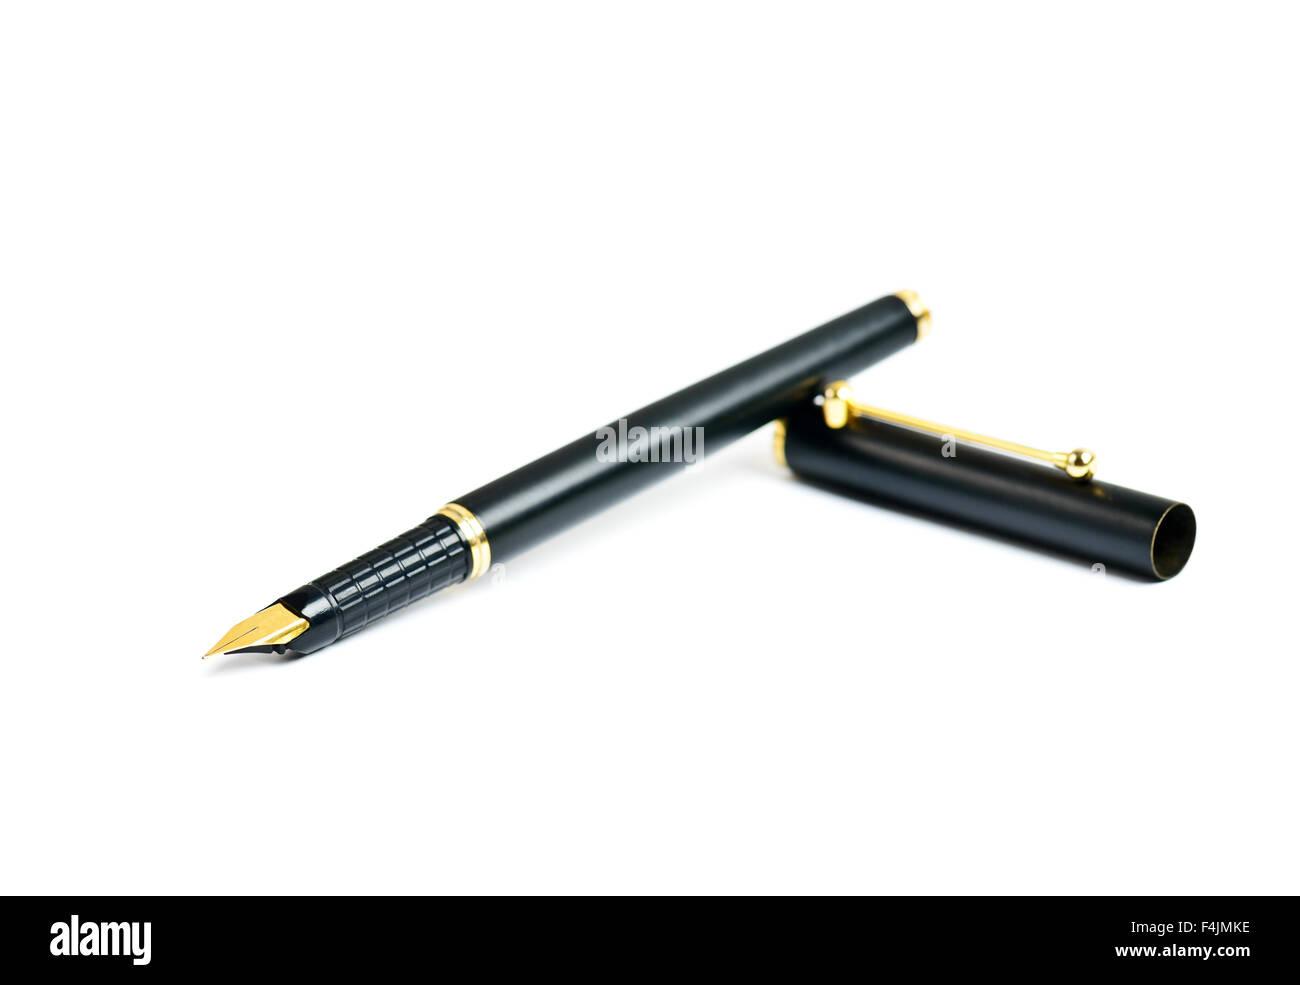 Elegance golden ink fountain pen isolated on white - Stock Image